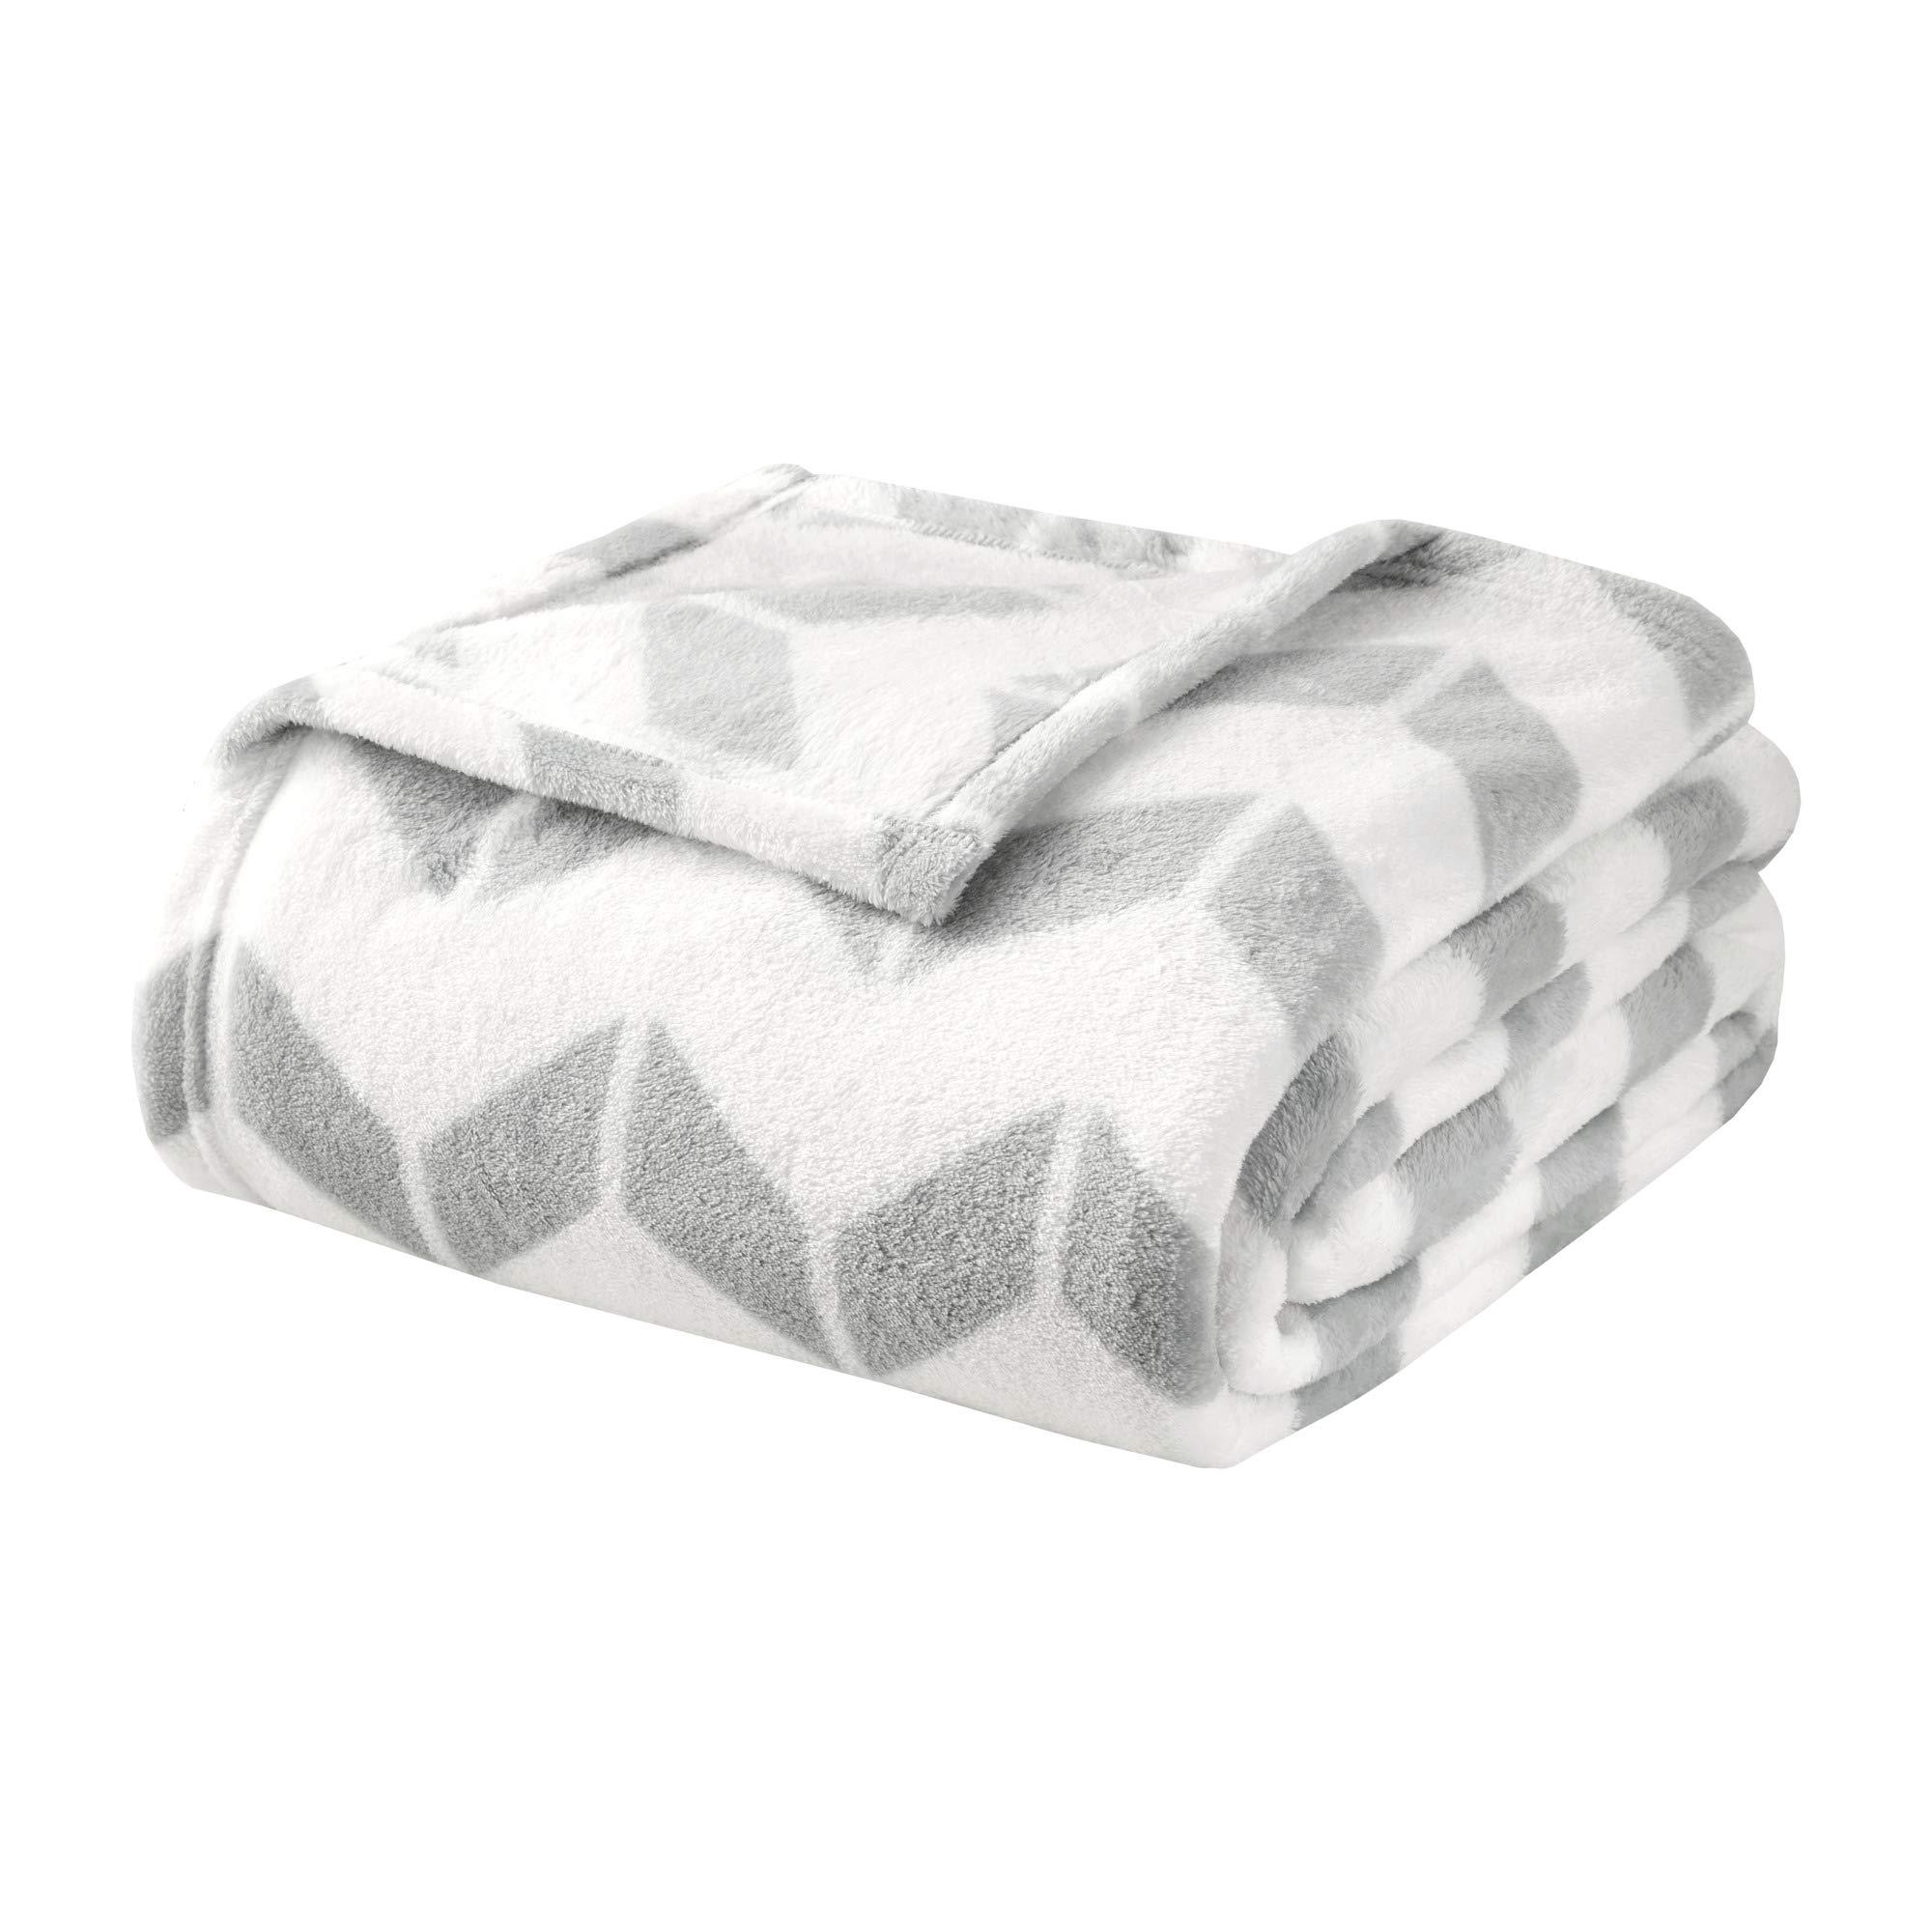 Intelligent Design  Chevron Luxury Plush Blanket Grey 90x92 Full/Queen Size Chevron Premium Soft Cozy Ultra Soft Microfiber For Bed, Couch or Sofa